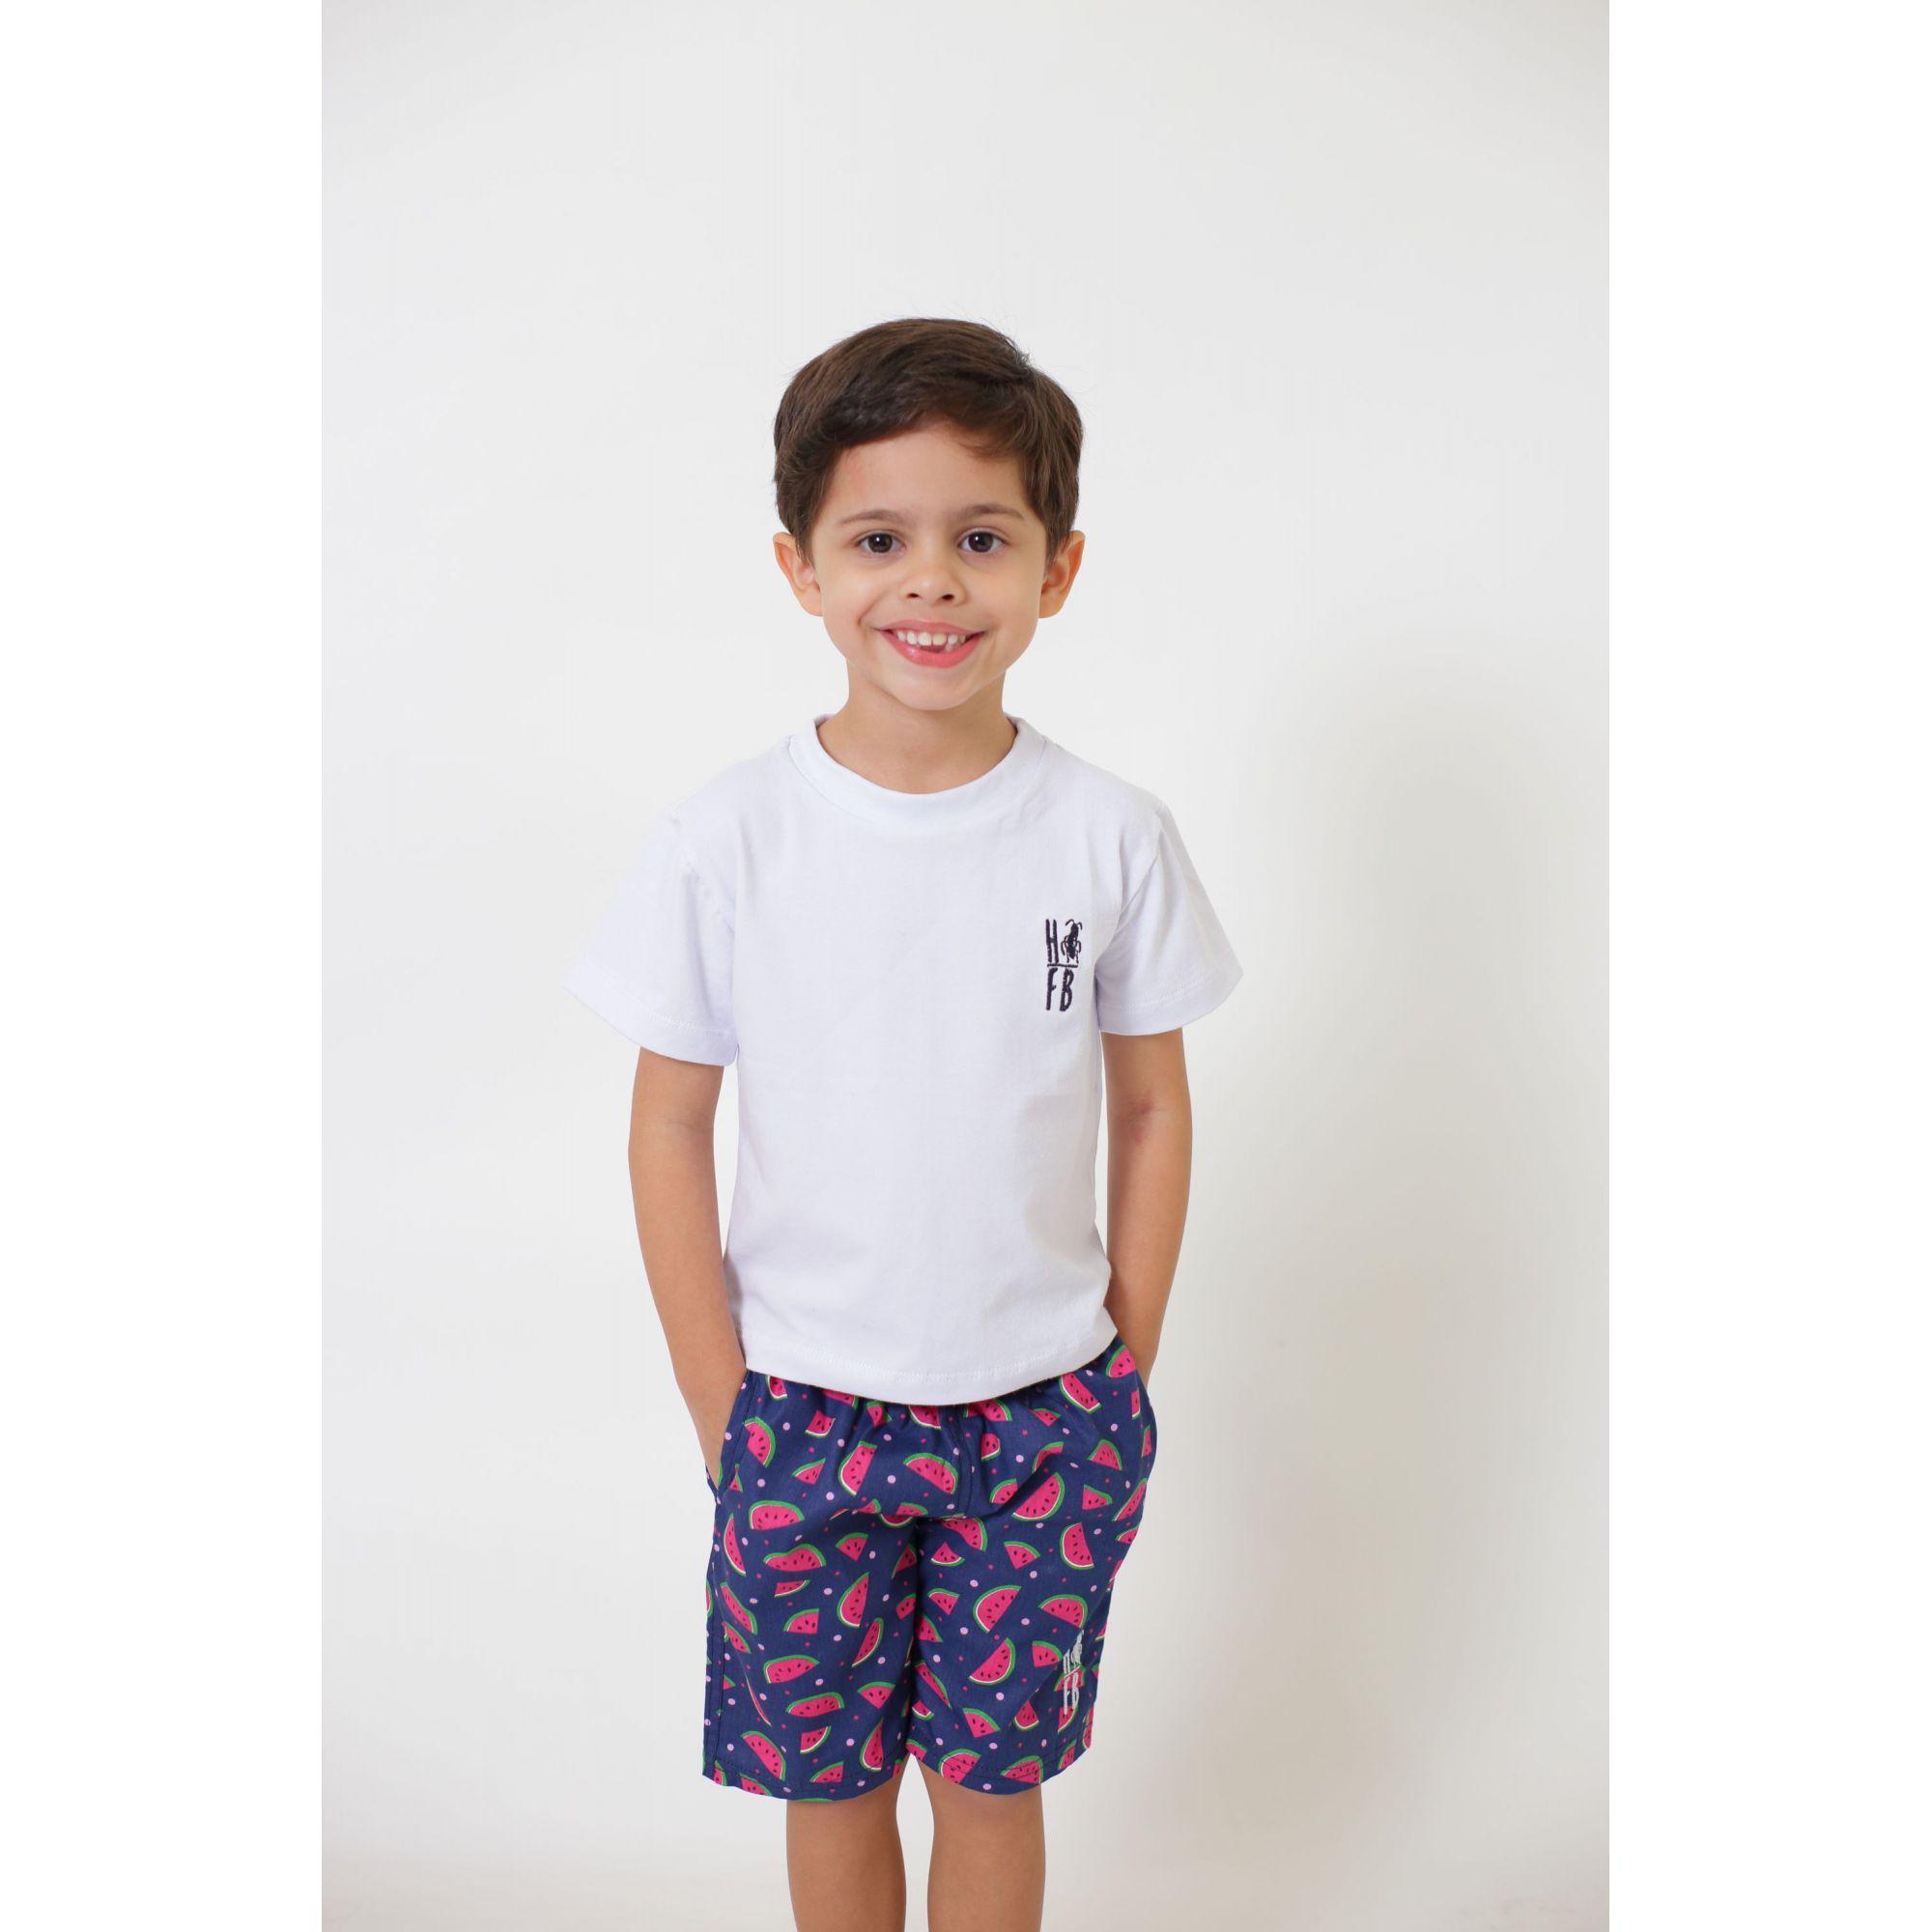 PAI E FILHO > Kit 02 Bermudas Melancia  [Coleção Tal Pai Tal Filho]  - Heitor Fashion Brazil